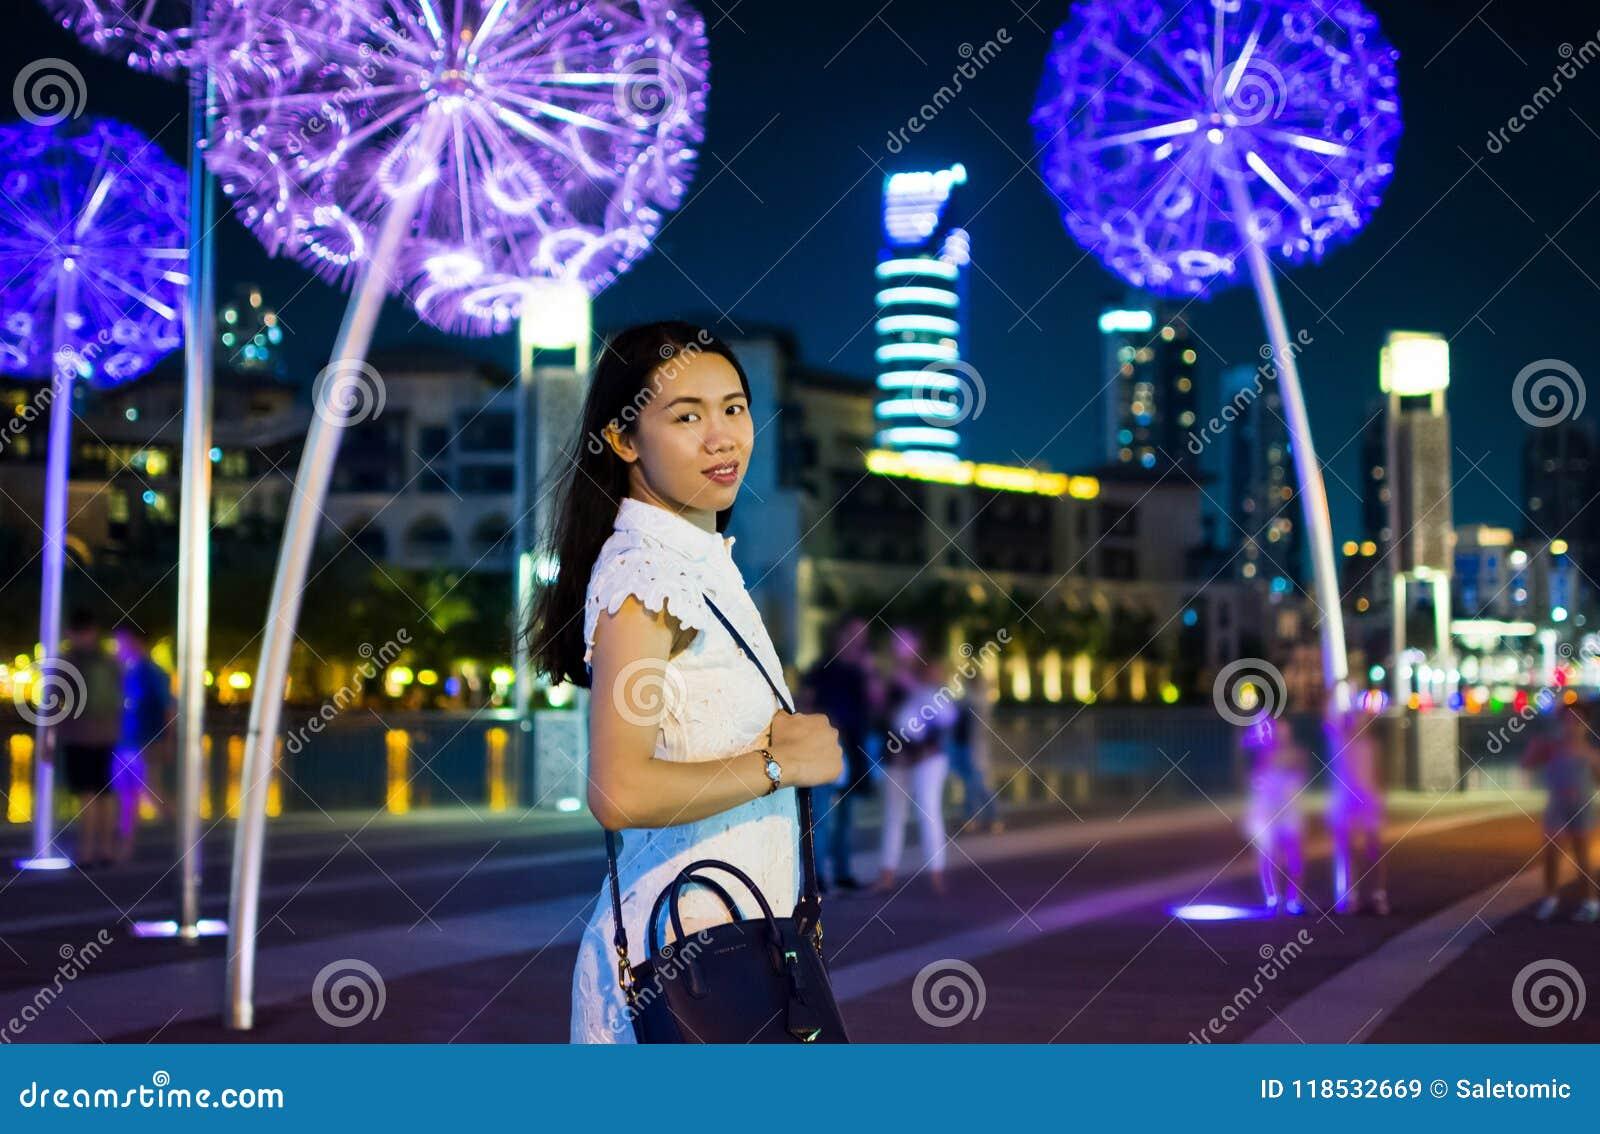 girl in dubai for a night